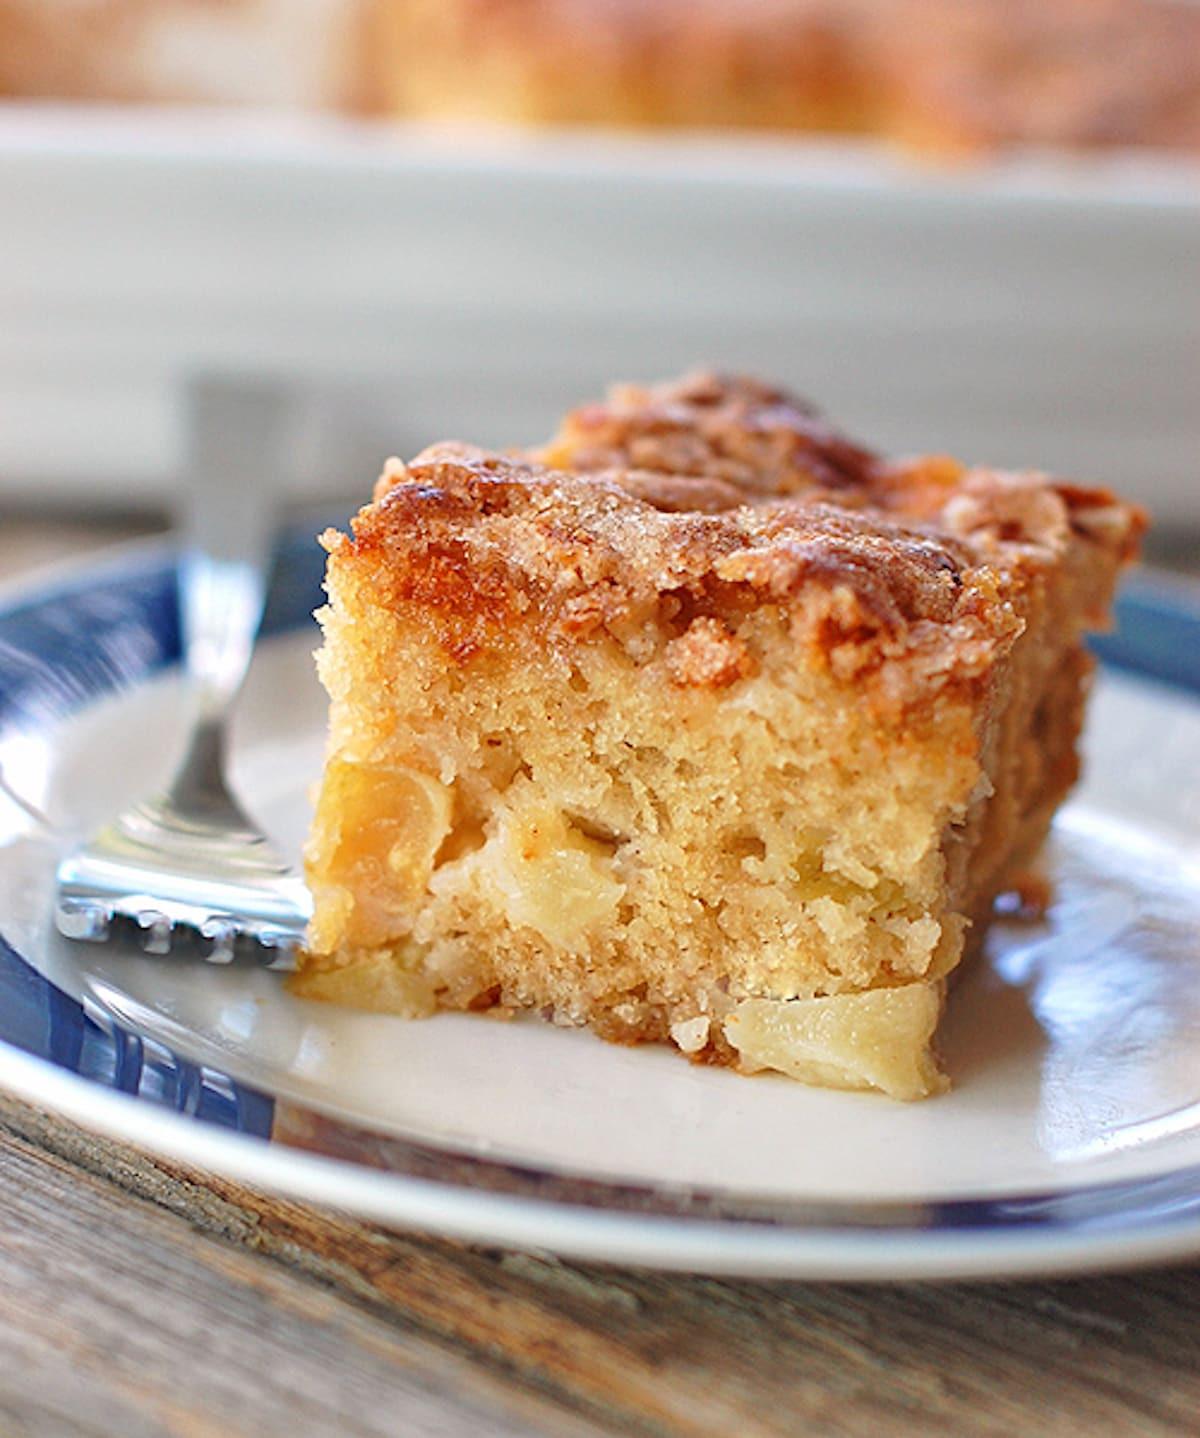 Healthy Apple Cake Recipes With Fresh Apples  Cinnamon Sugar Apple Cake Recipe Pinch of Yum